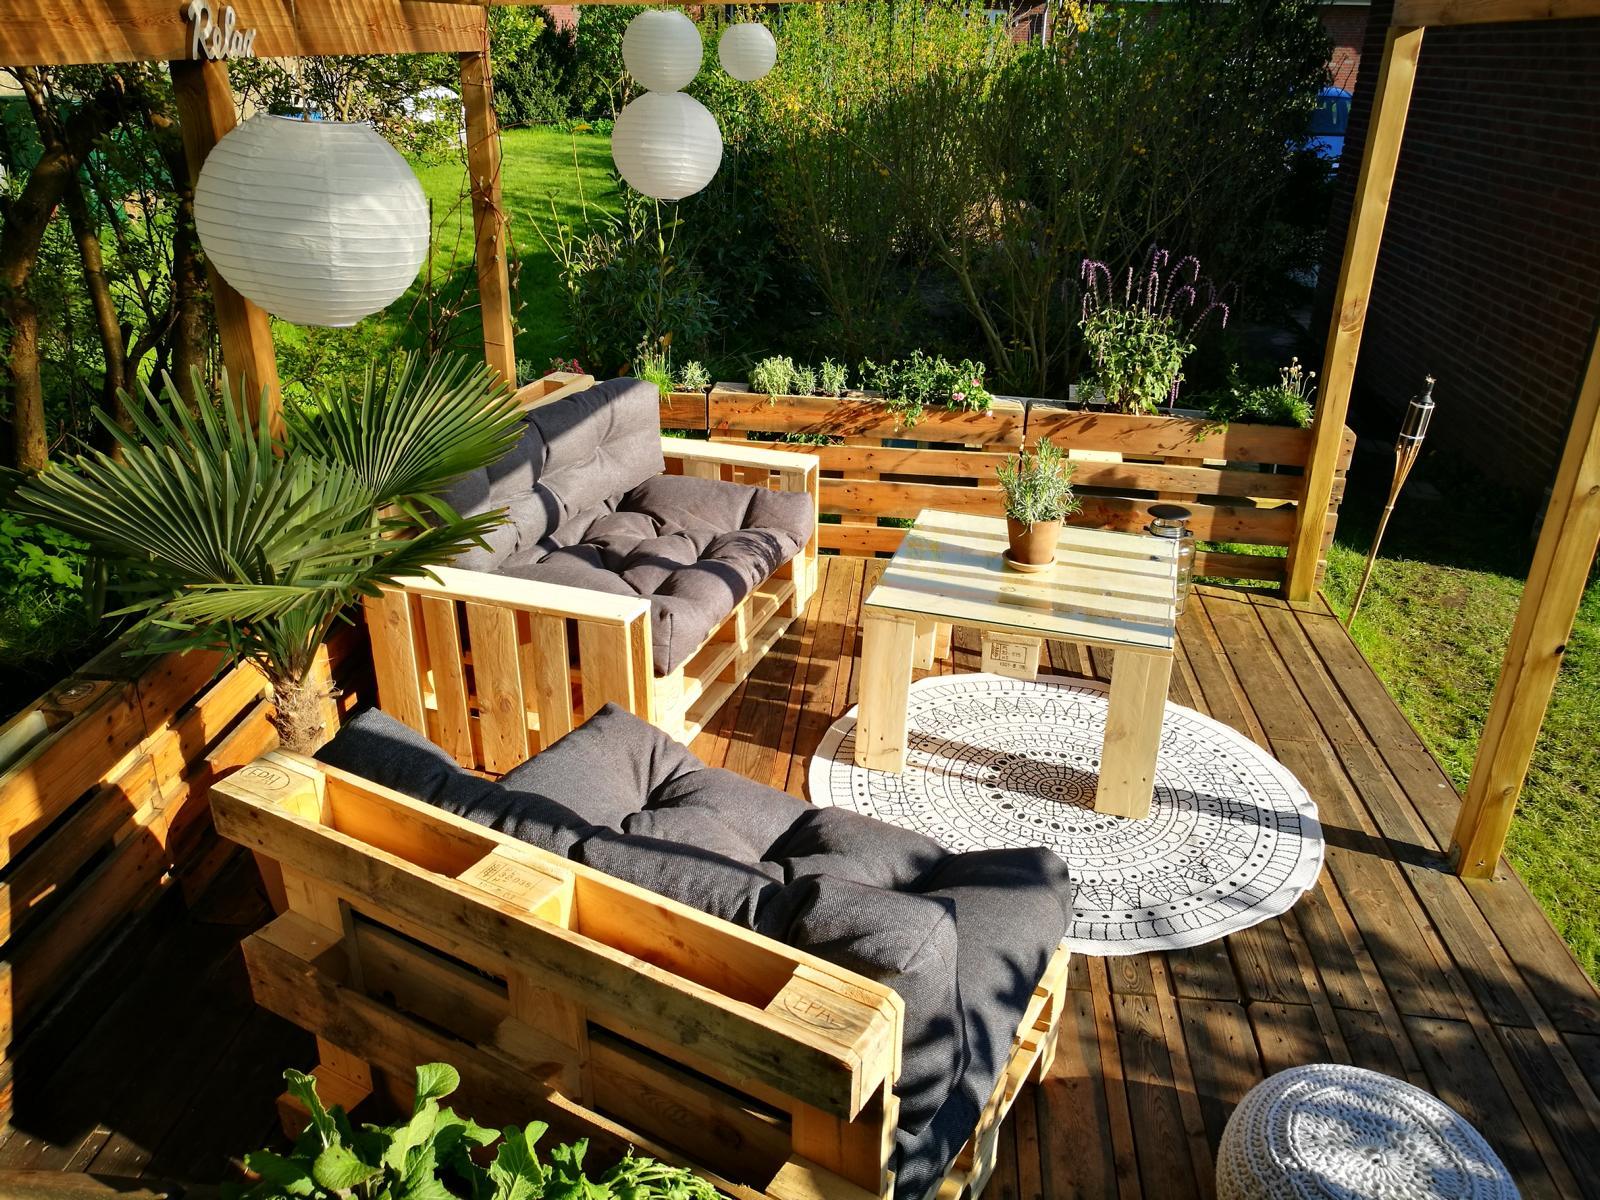 Palettenmöbel-Garten